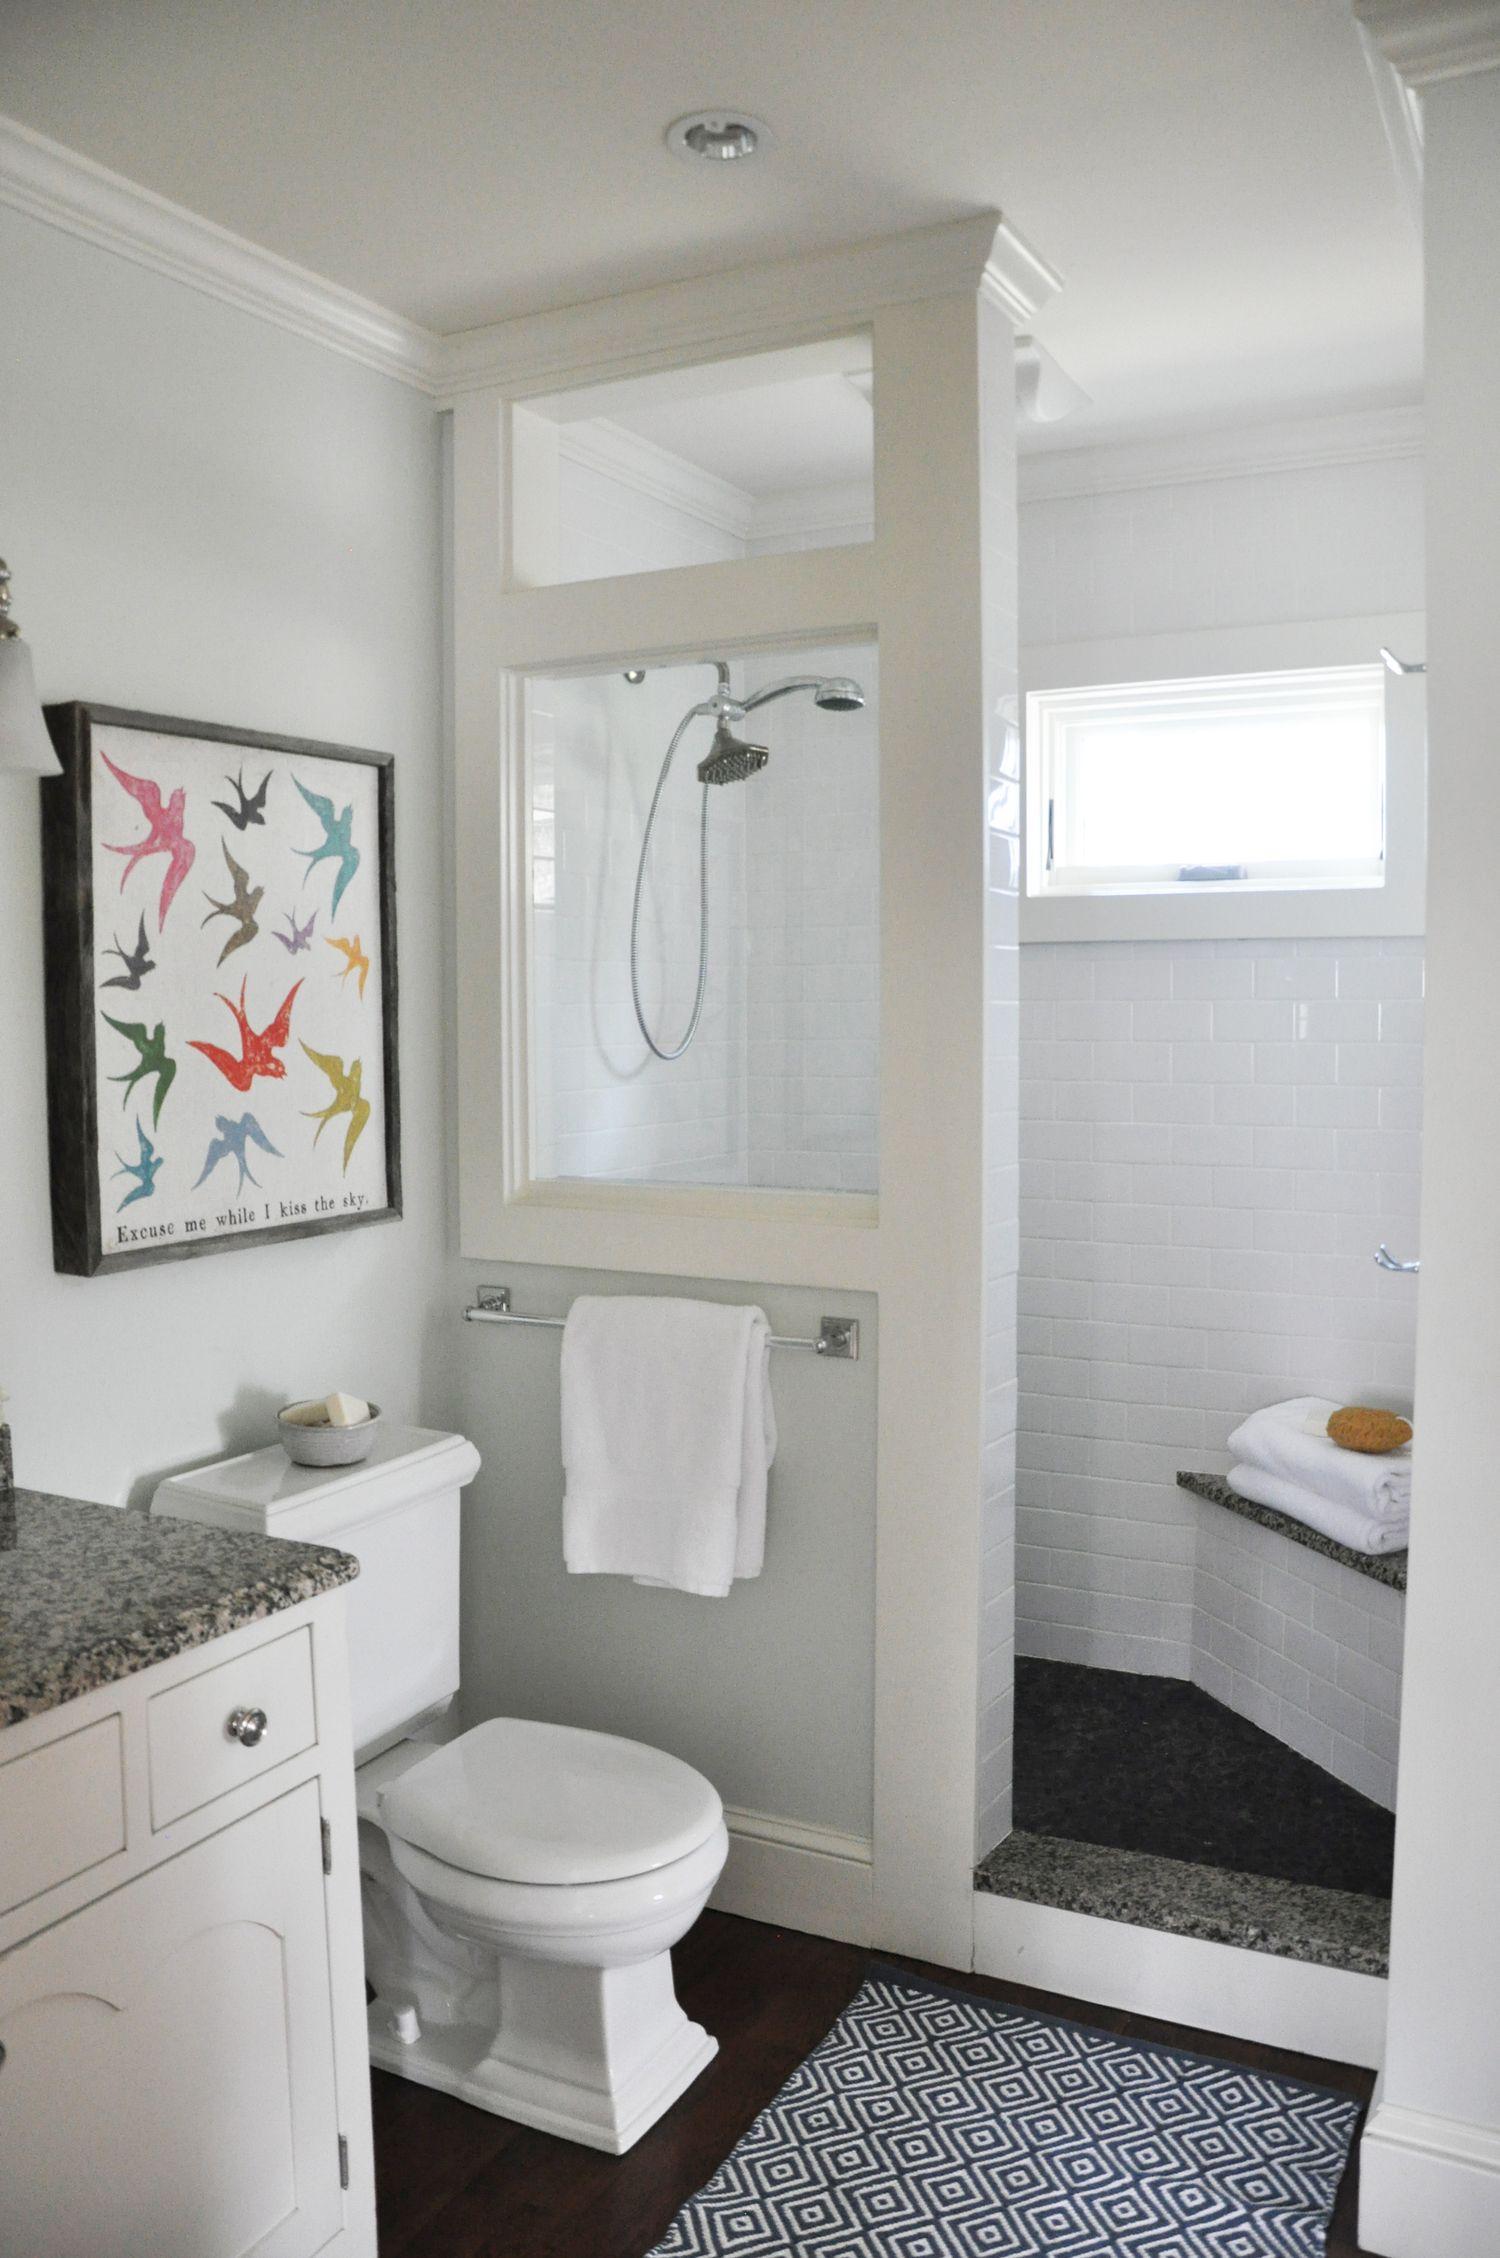 Dsc 0018 Jpg Small Bathroom With Shower Bathroom Remodel Shower Small Master Bathroom